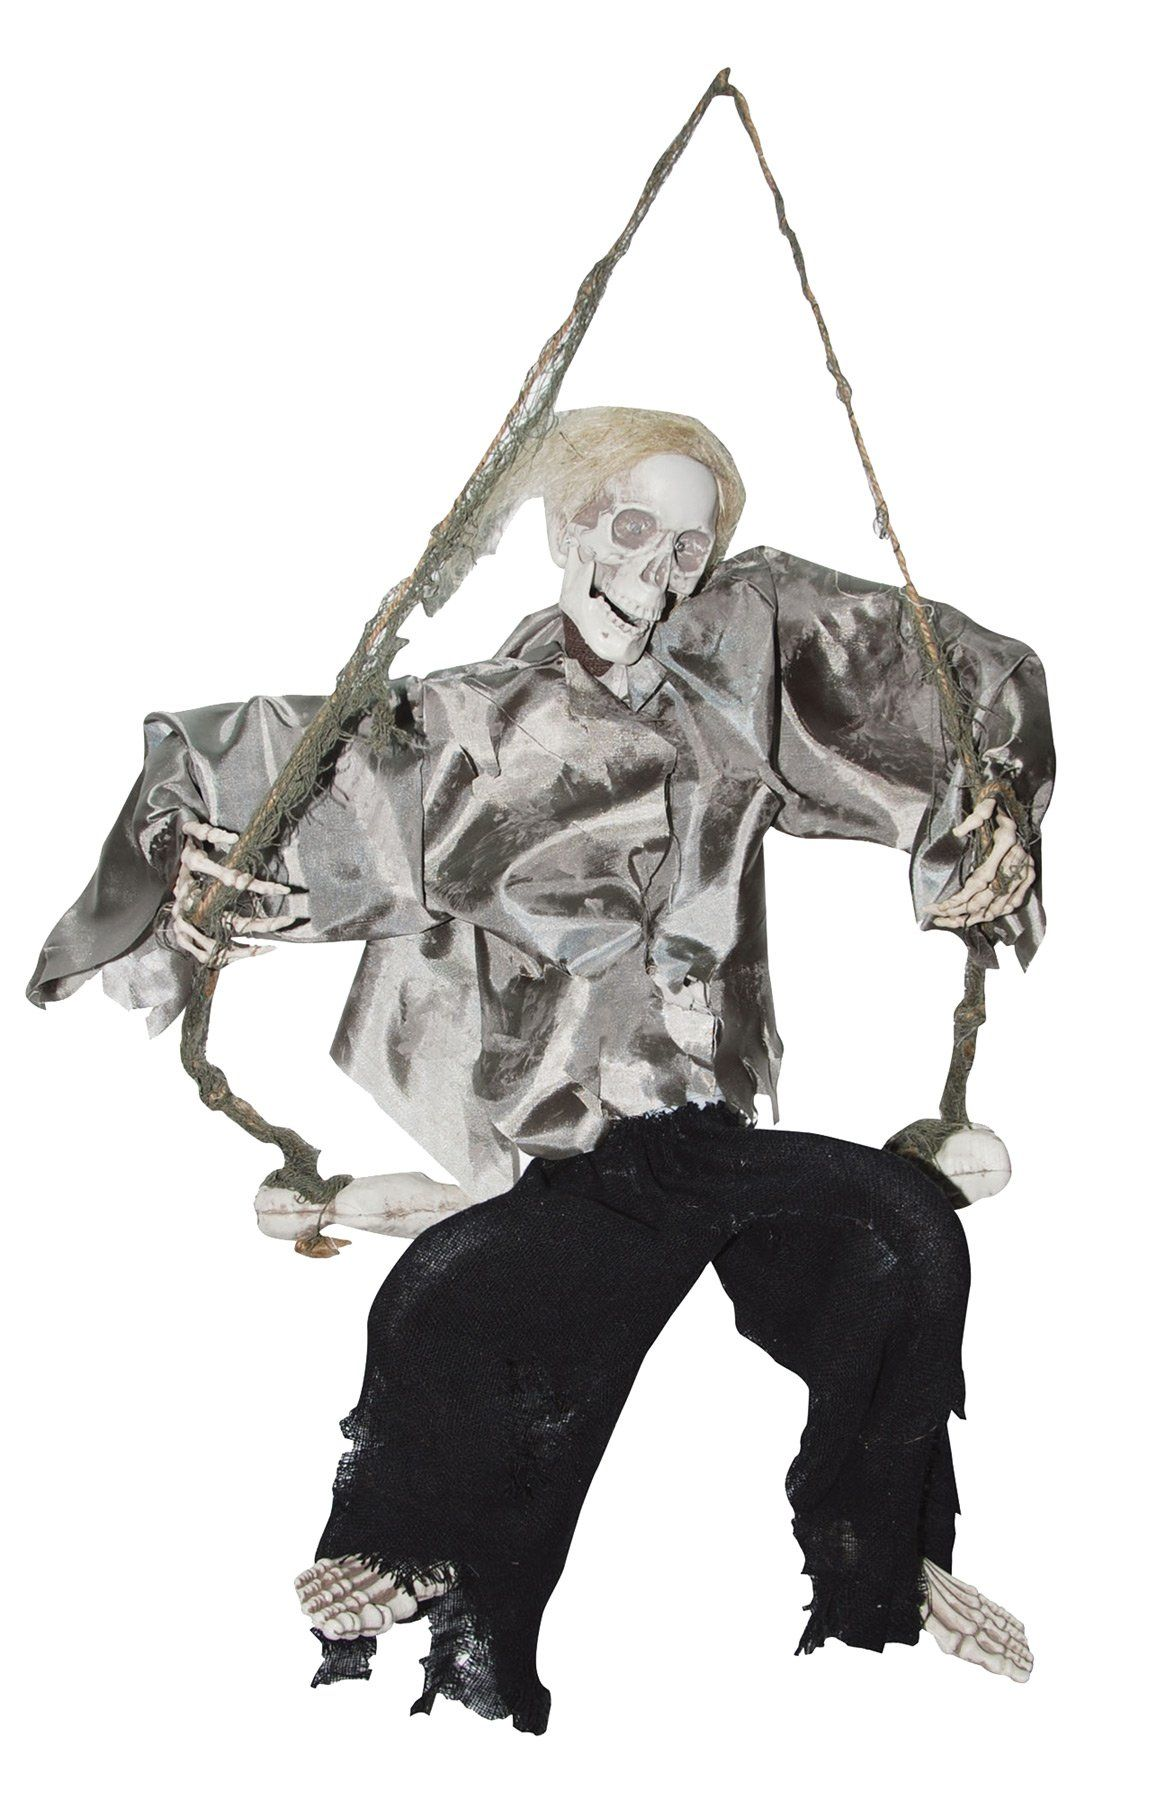 Kicking Reaper On A Swing Halloween props, Halloween